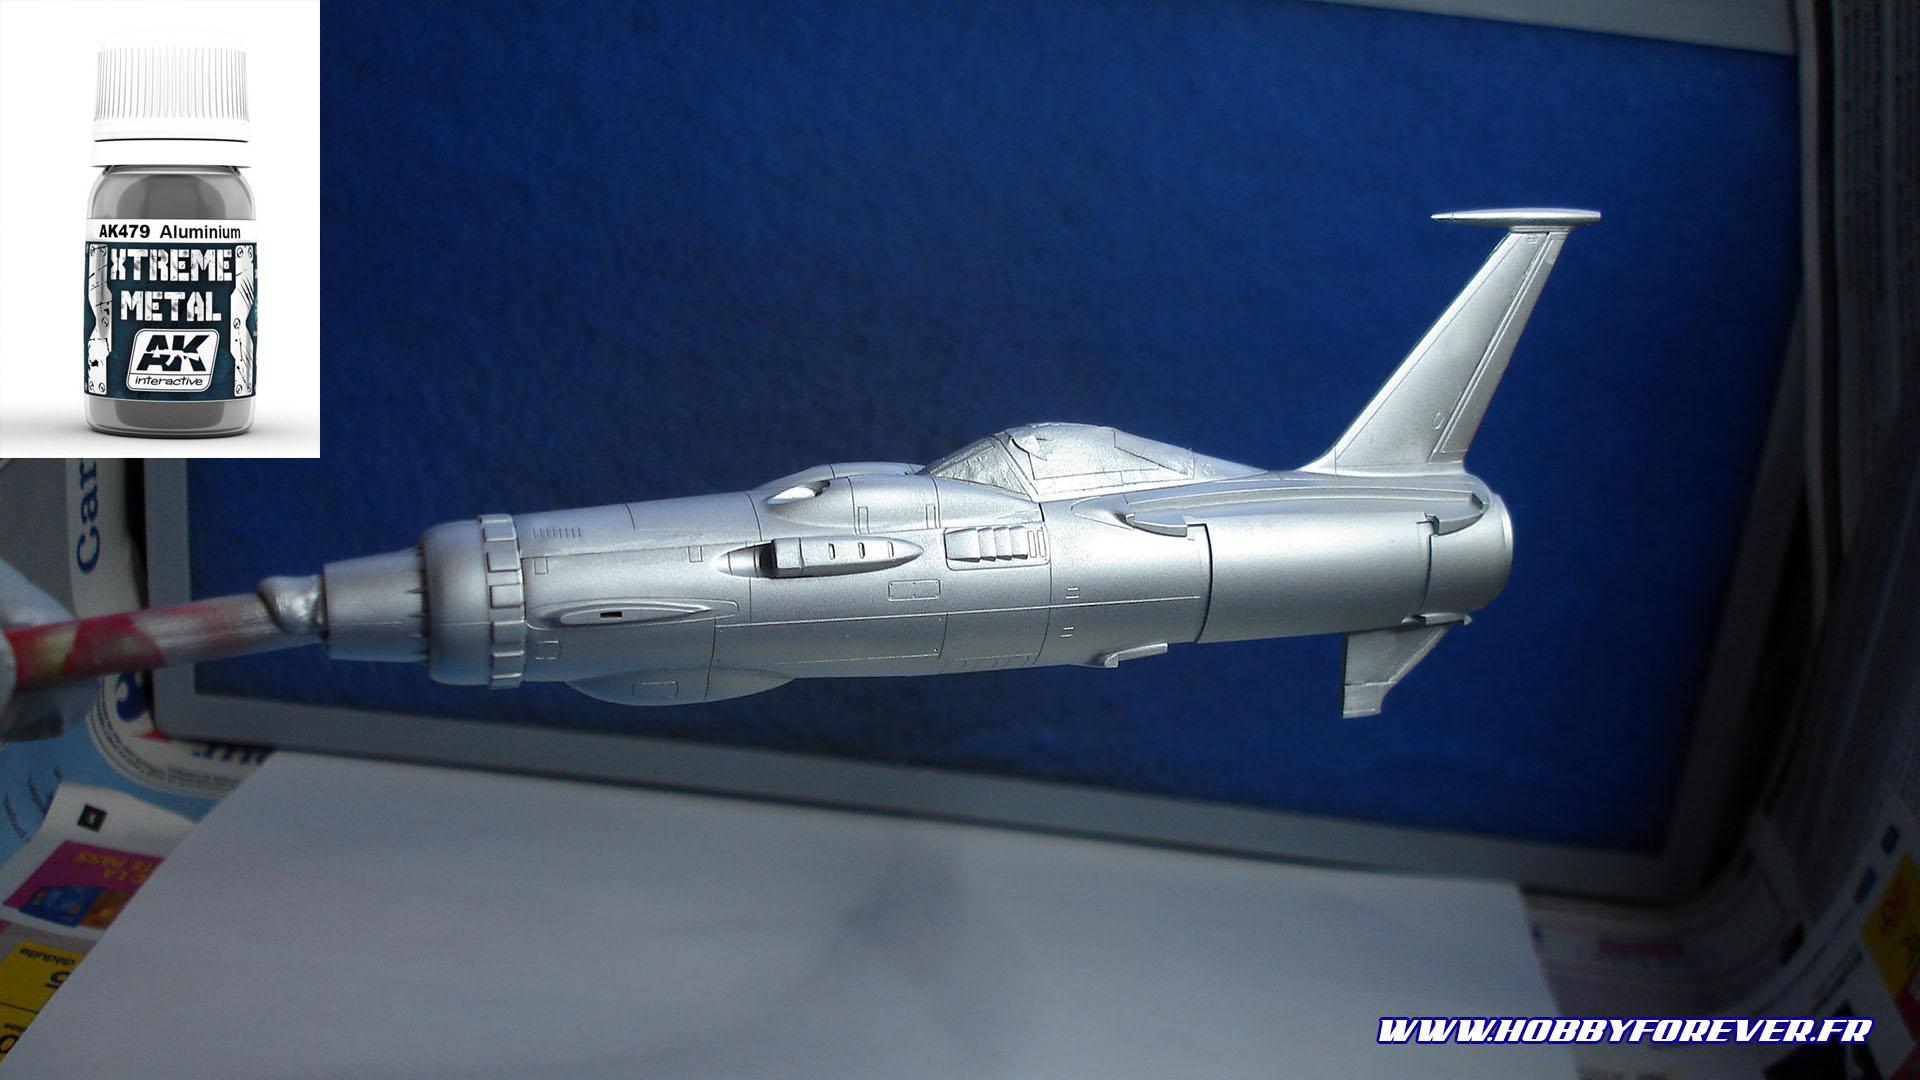 Couche d'aluminium AK Xtrem Metal